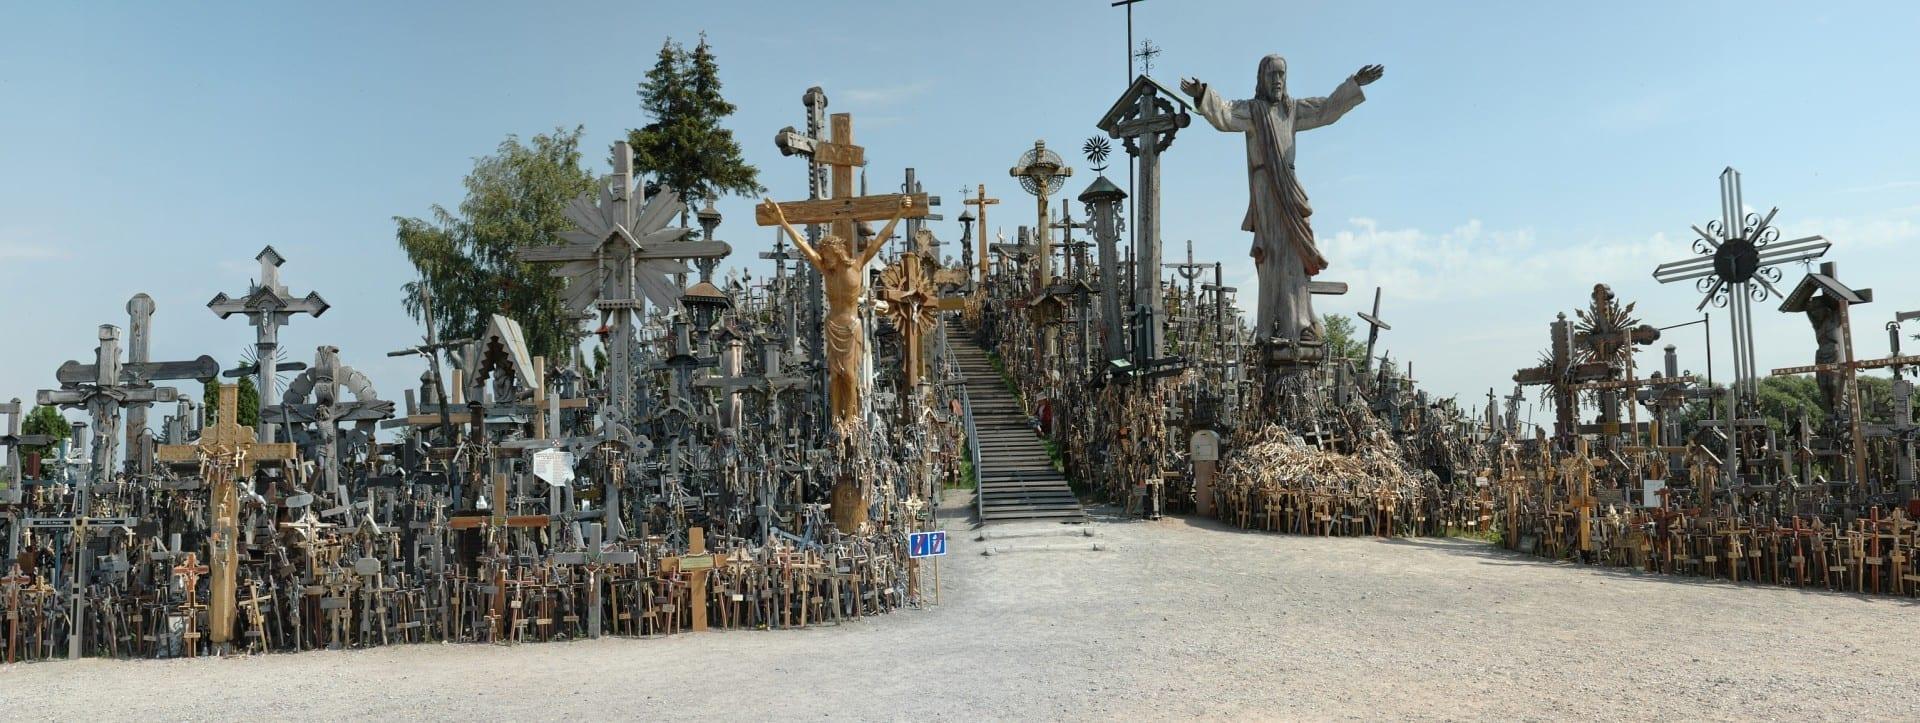 La Colina de las Cruces Siauliai Lituania